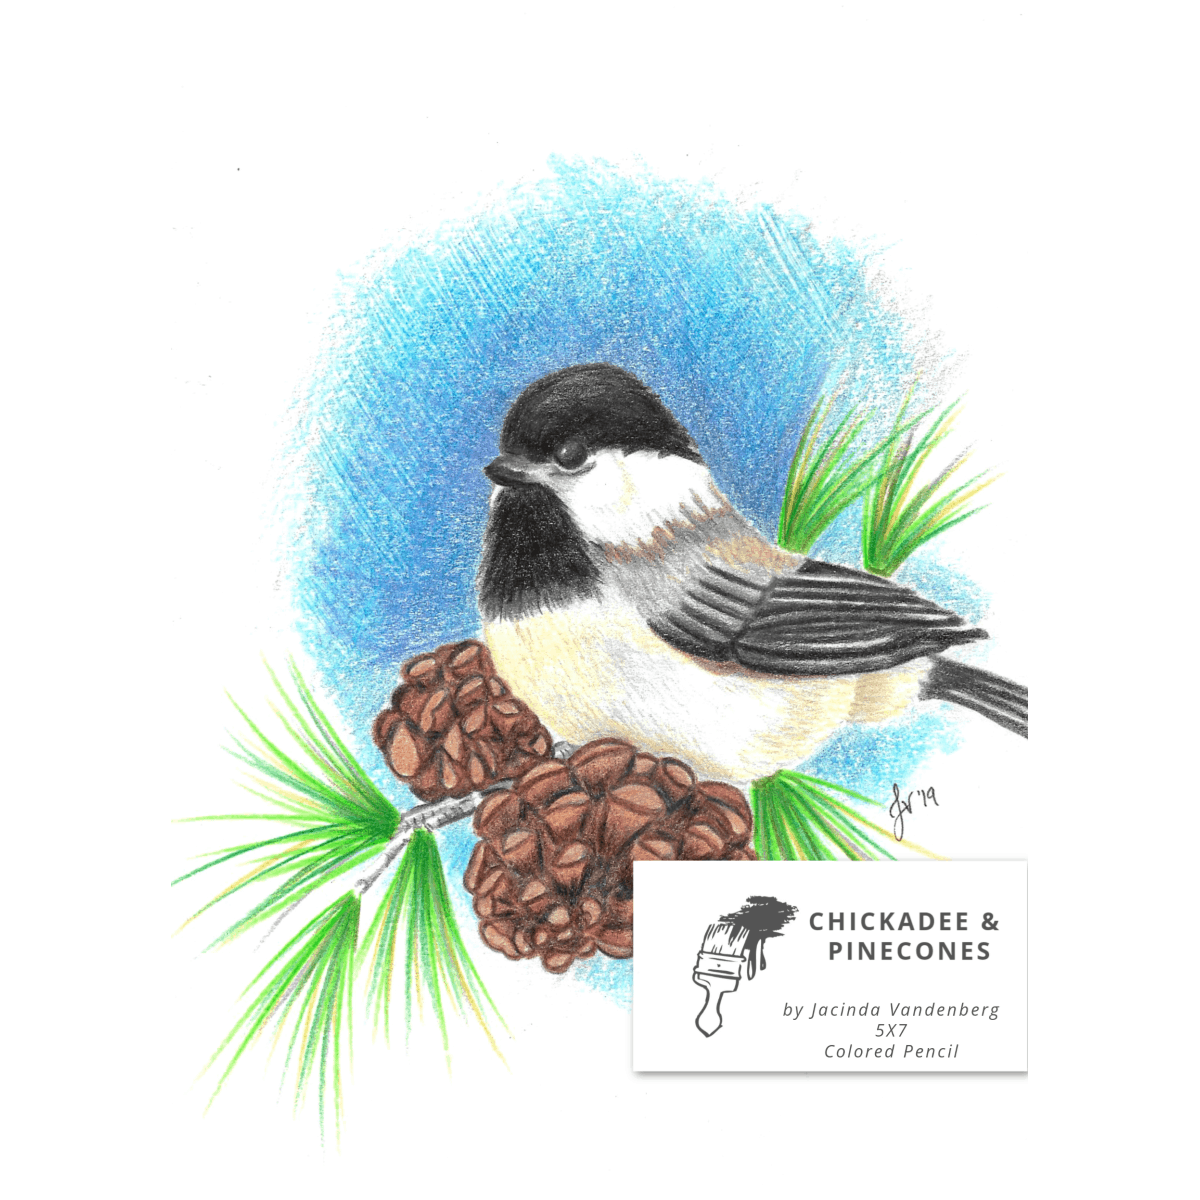 5x7 Chickadee & Pinecones in Colored Pencil